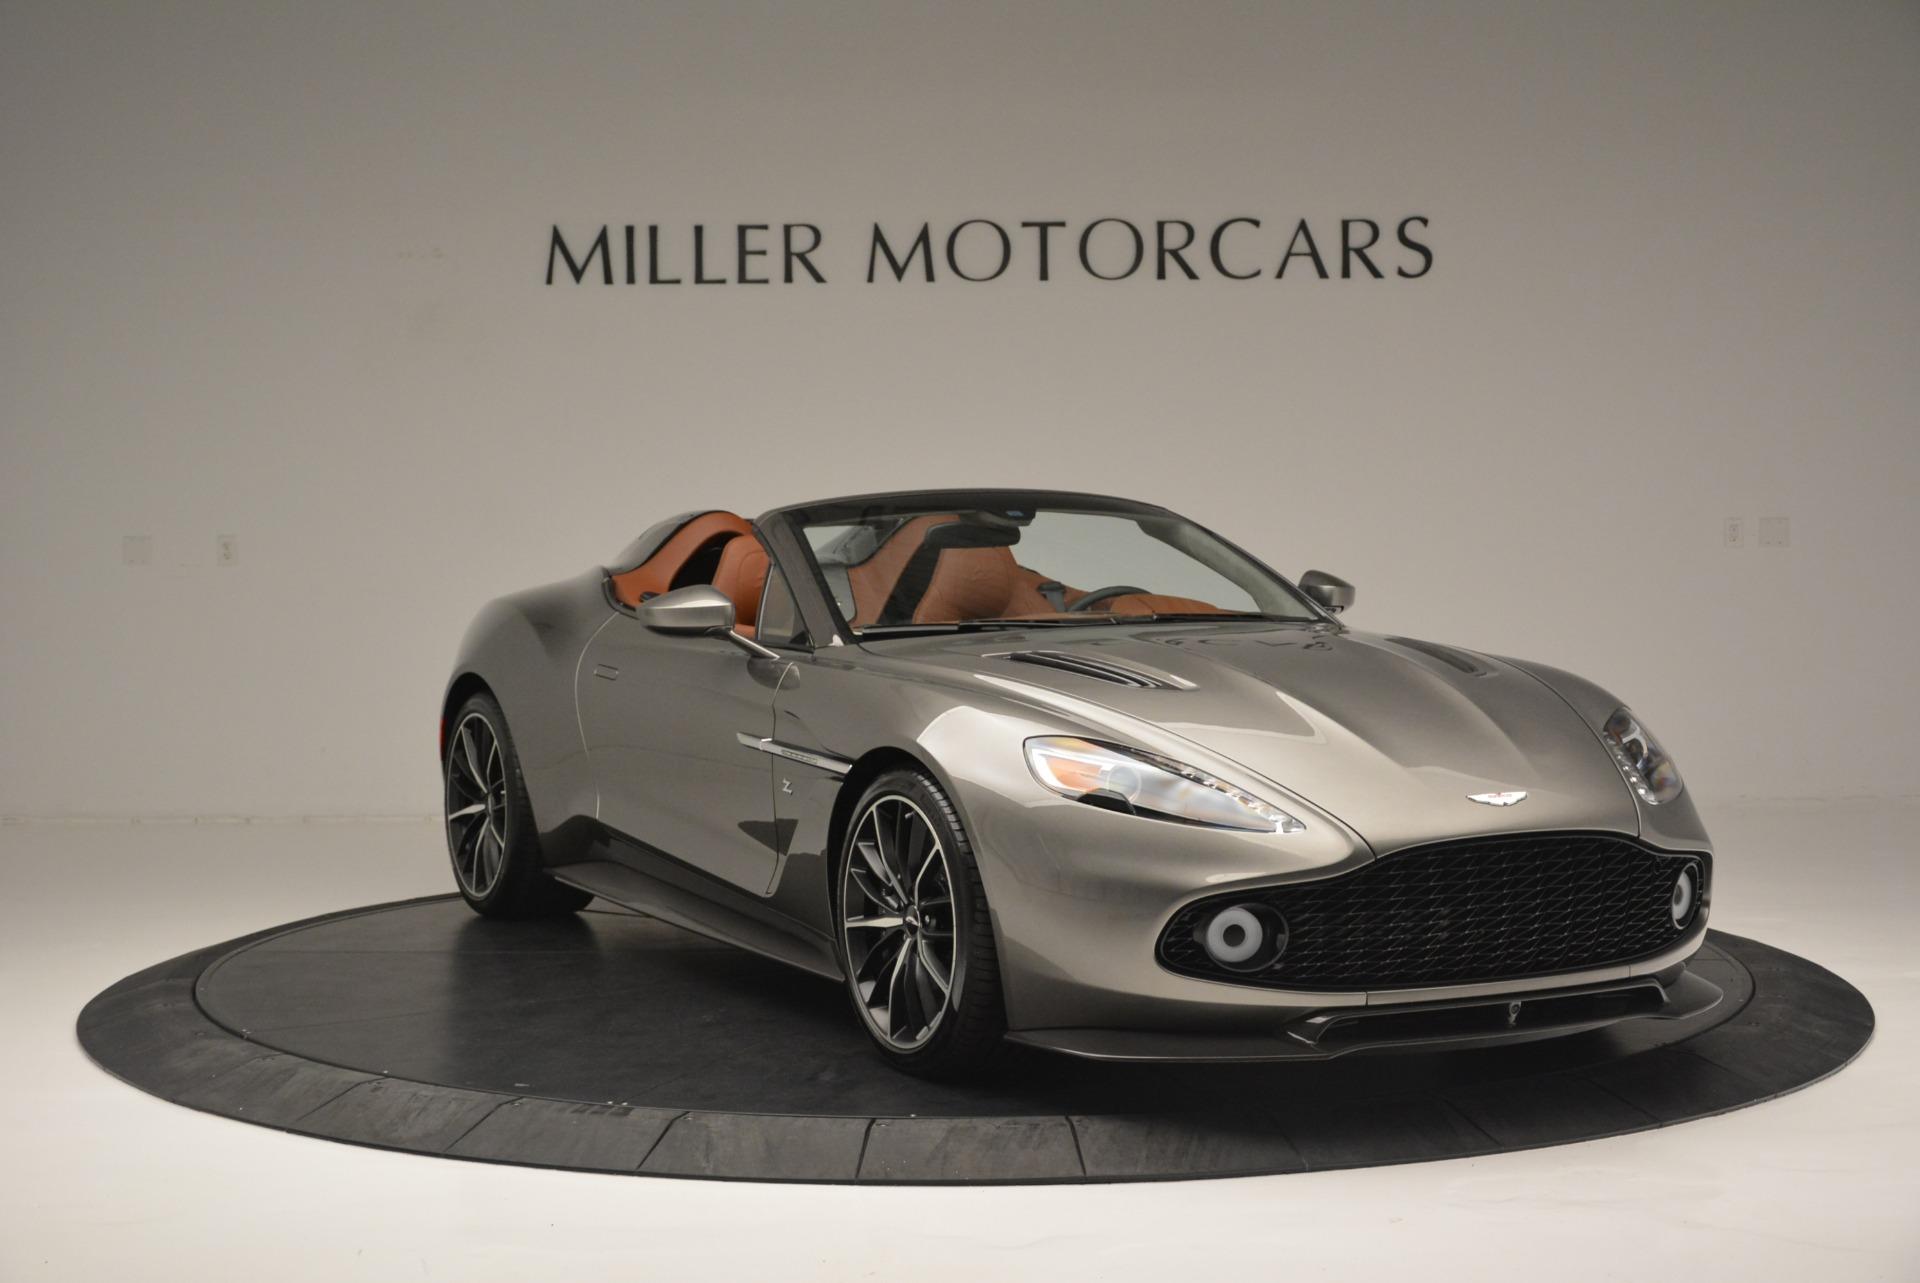 Pre Owned 2018 Aston Martin Zagato Speedster Convertible For Sale 1 550 000 Miller Motorcars Stock 7466c